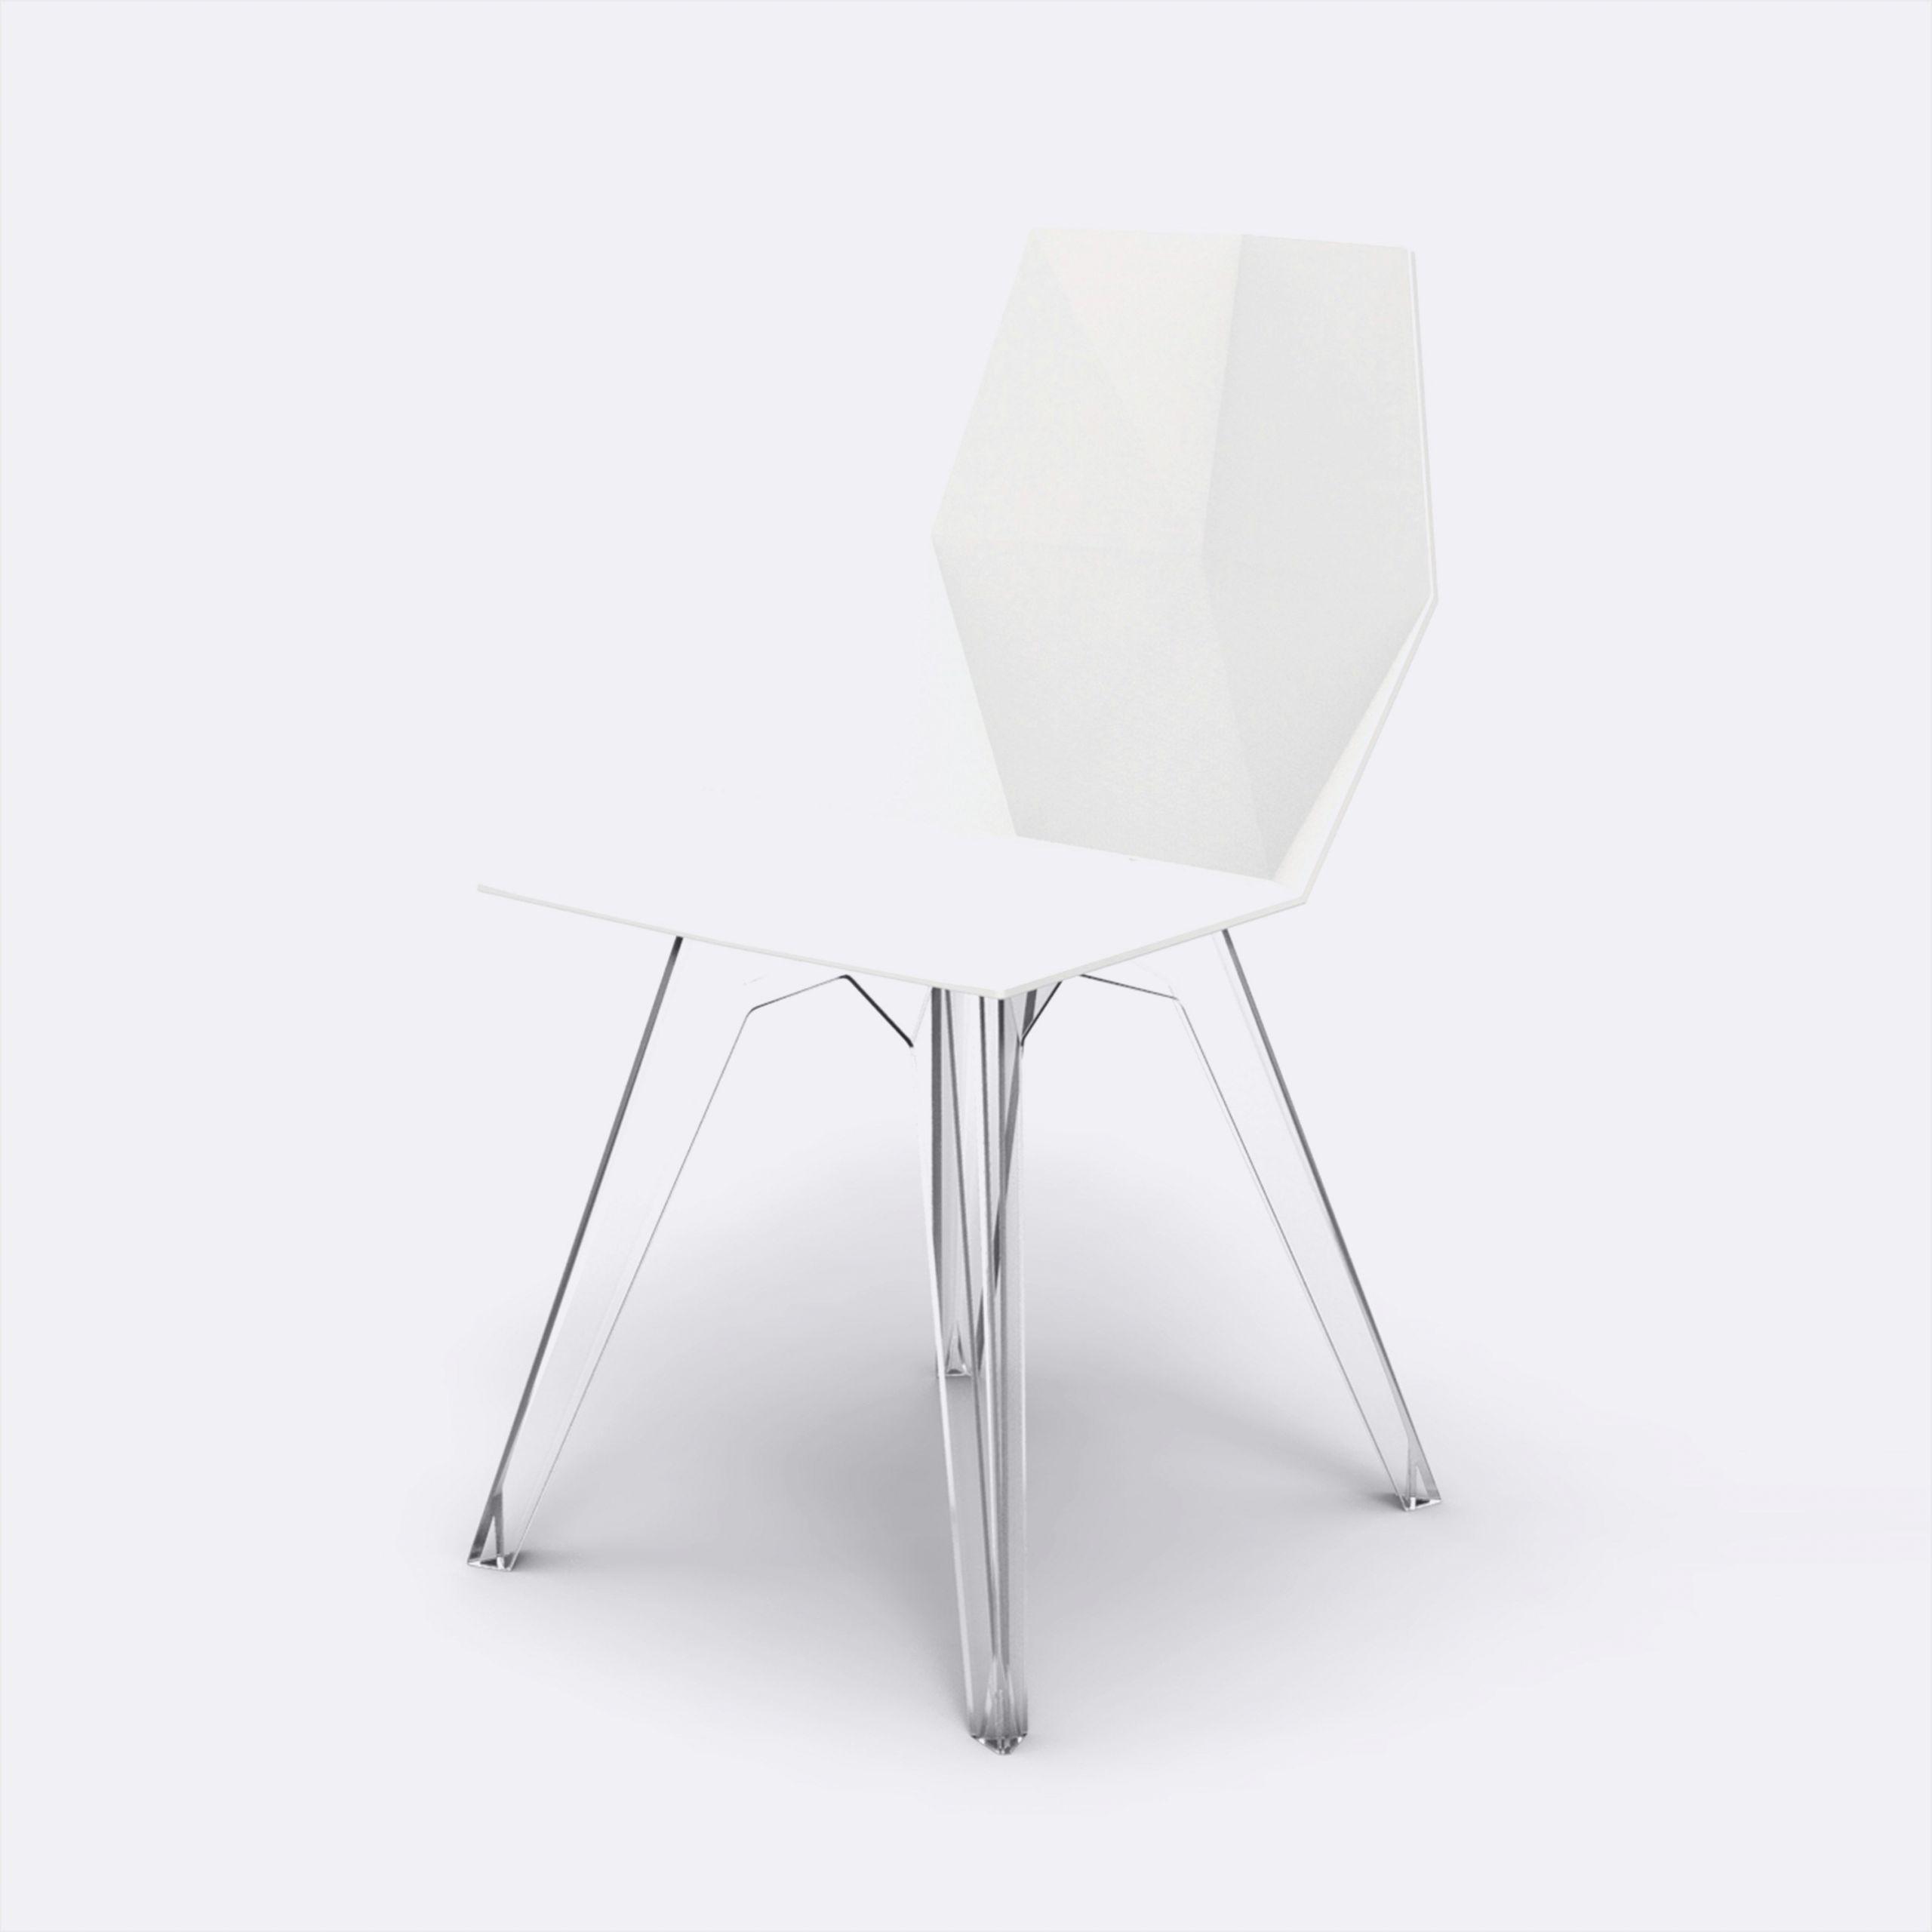 chaise en plexi meuble en plexiglas table en plexiglas inspirational chaise plexi of chaise en plexi